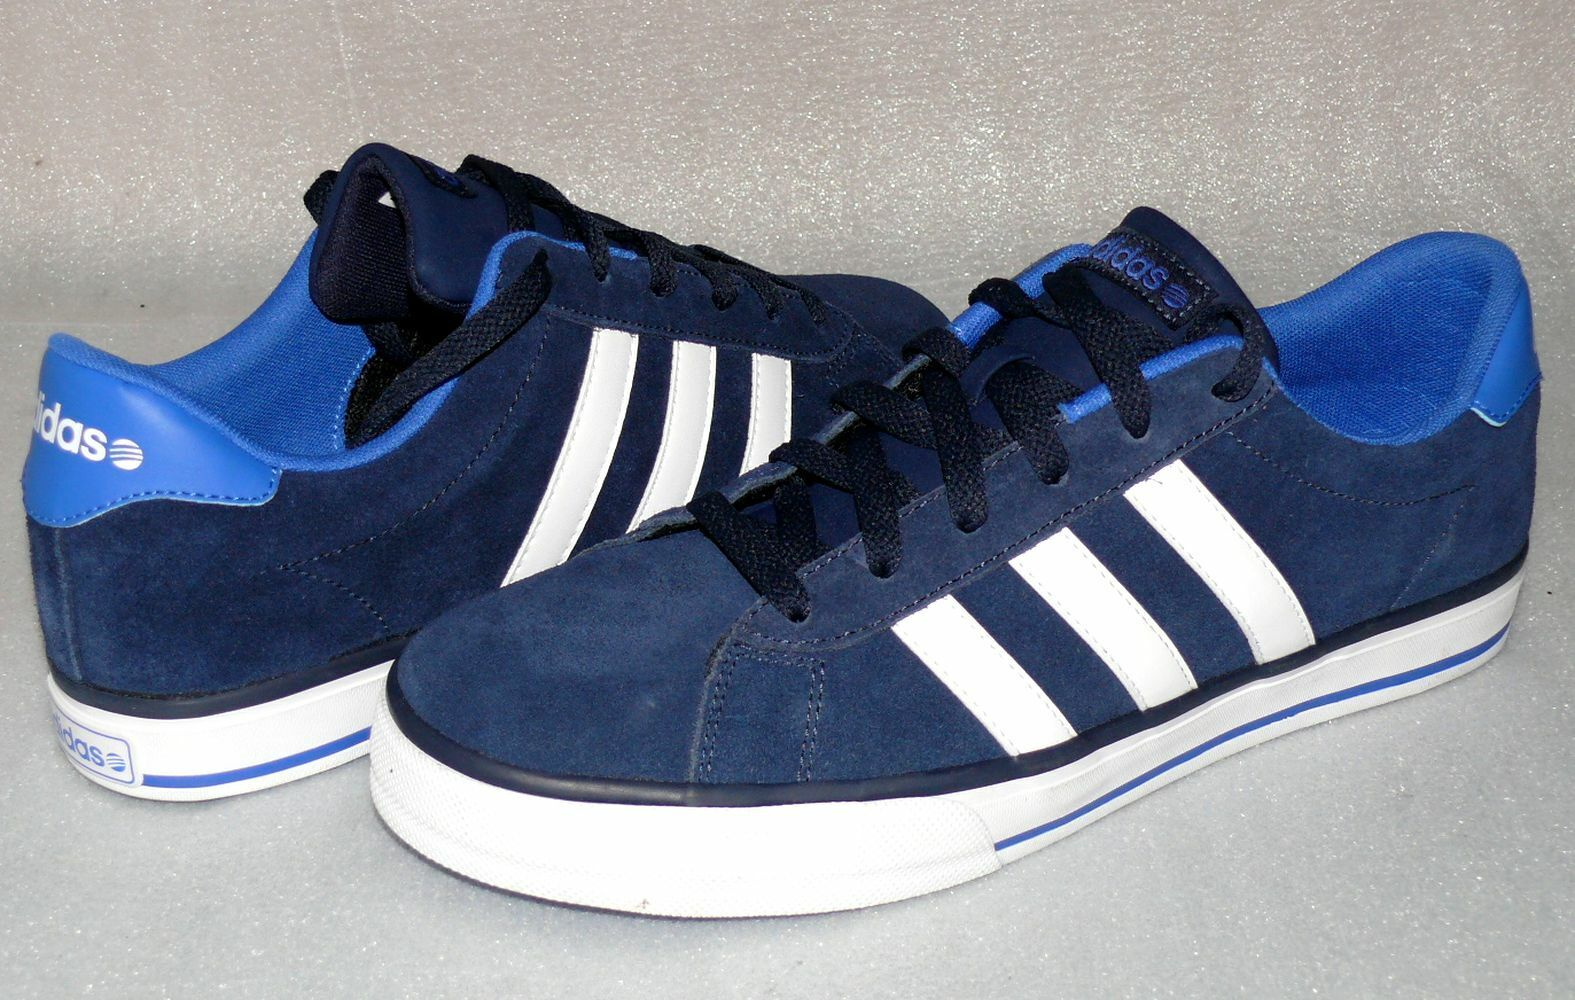 Adidas Neo F97751 Daily Ortholite Rau UP Velour Leder Schuhe Turnschuhe 44 48 Navy